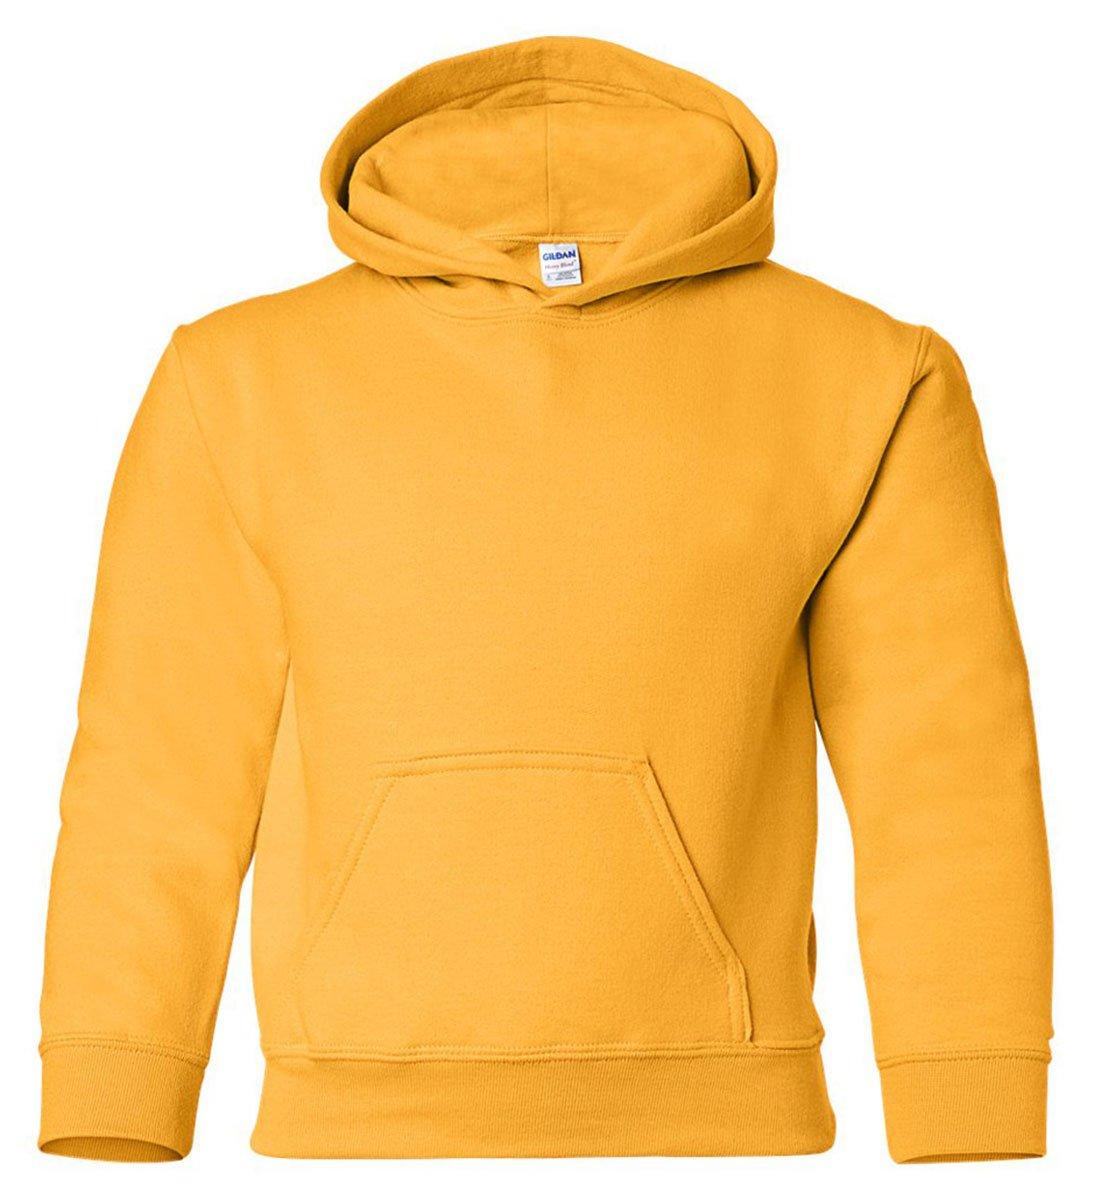 Gildan 18500B Heavy Blend Youth Hooded Sweatshirt M25236